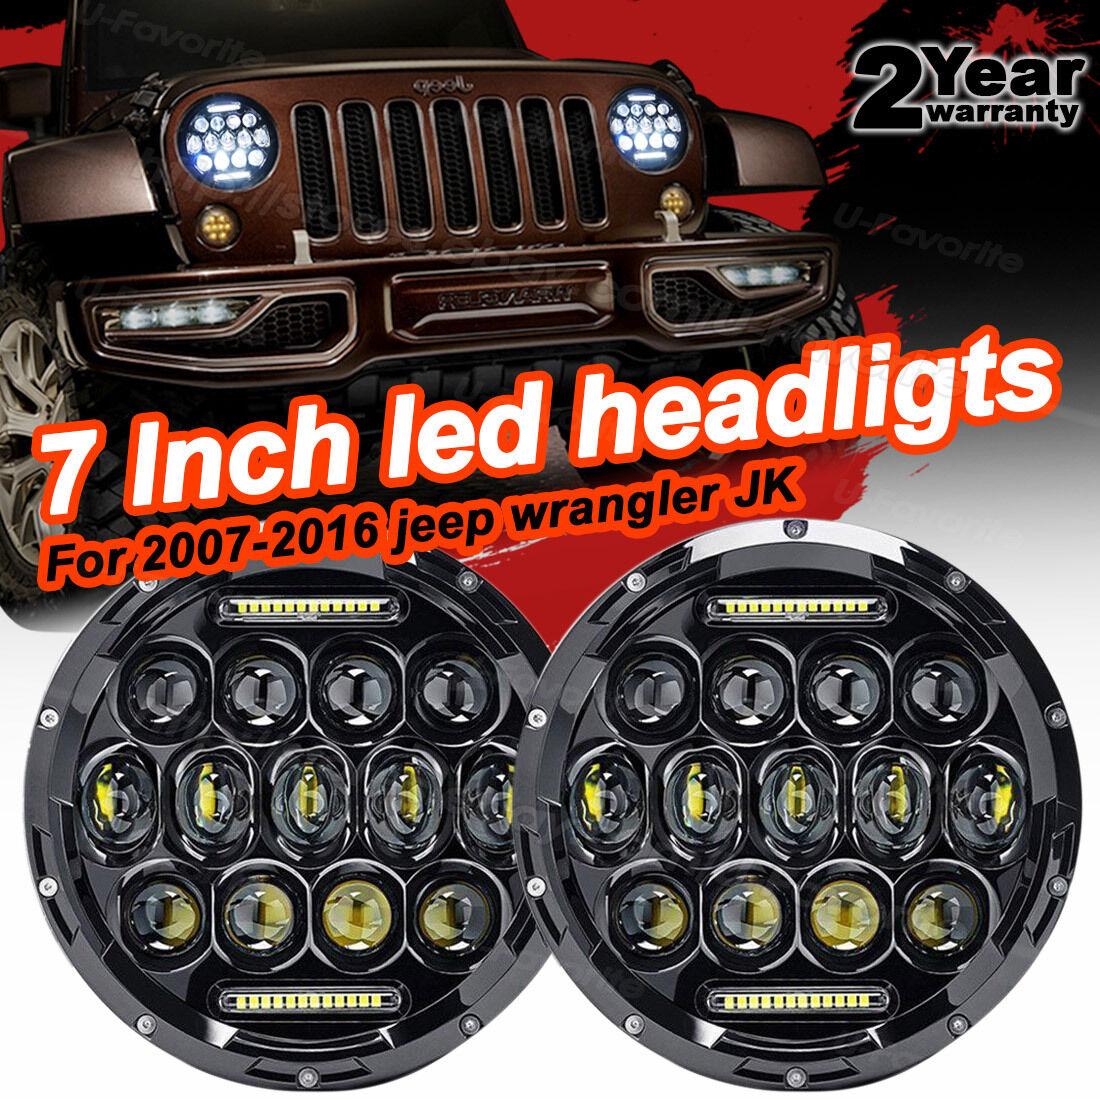 "firebug jeep wrangler 7"" round led headlights lamp with drl, jk"